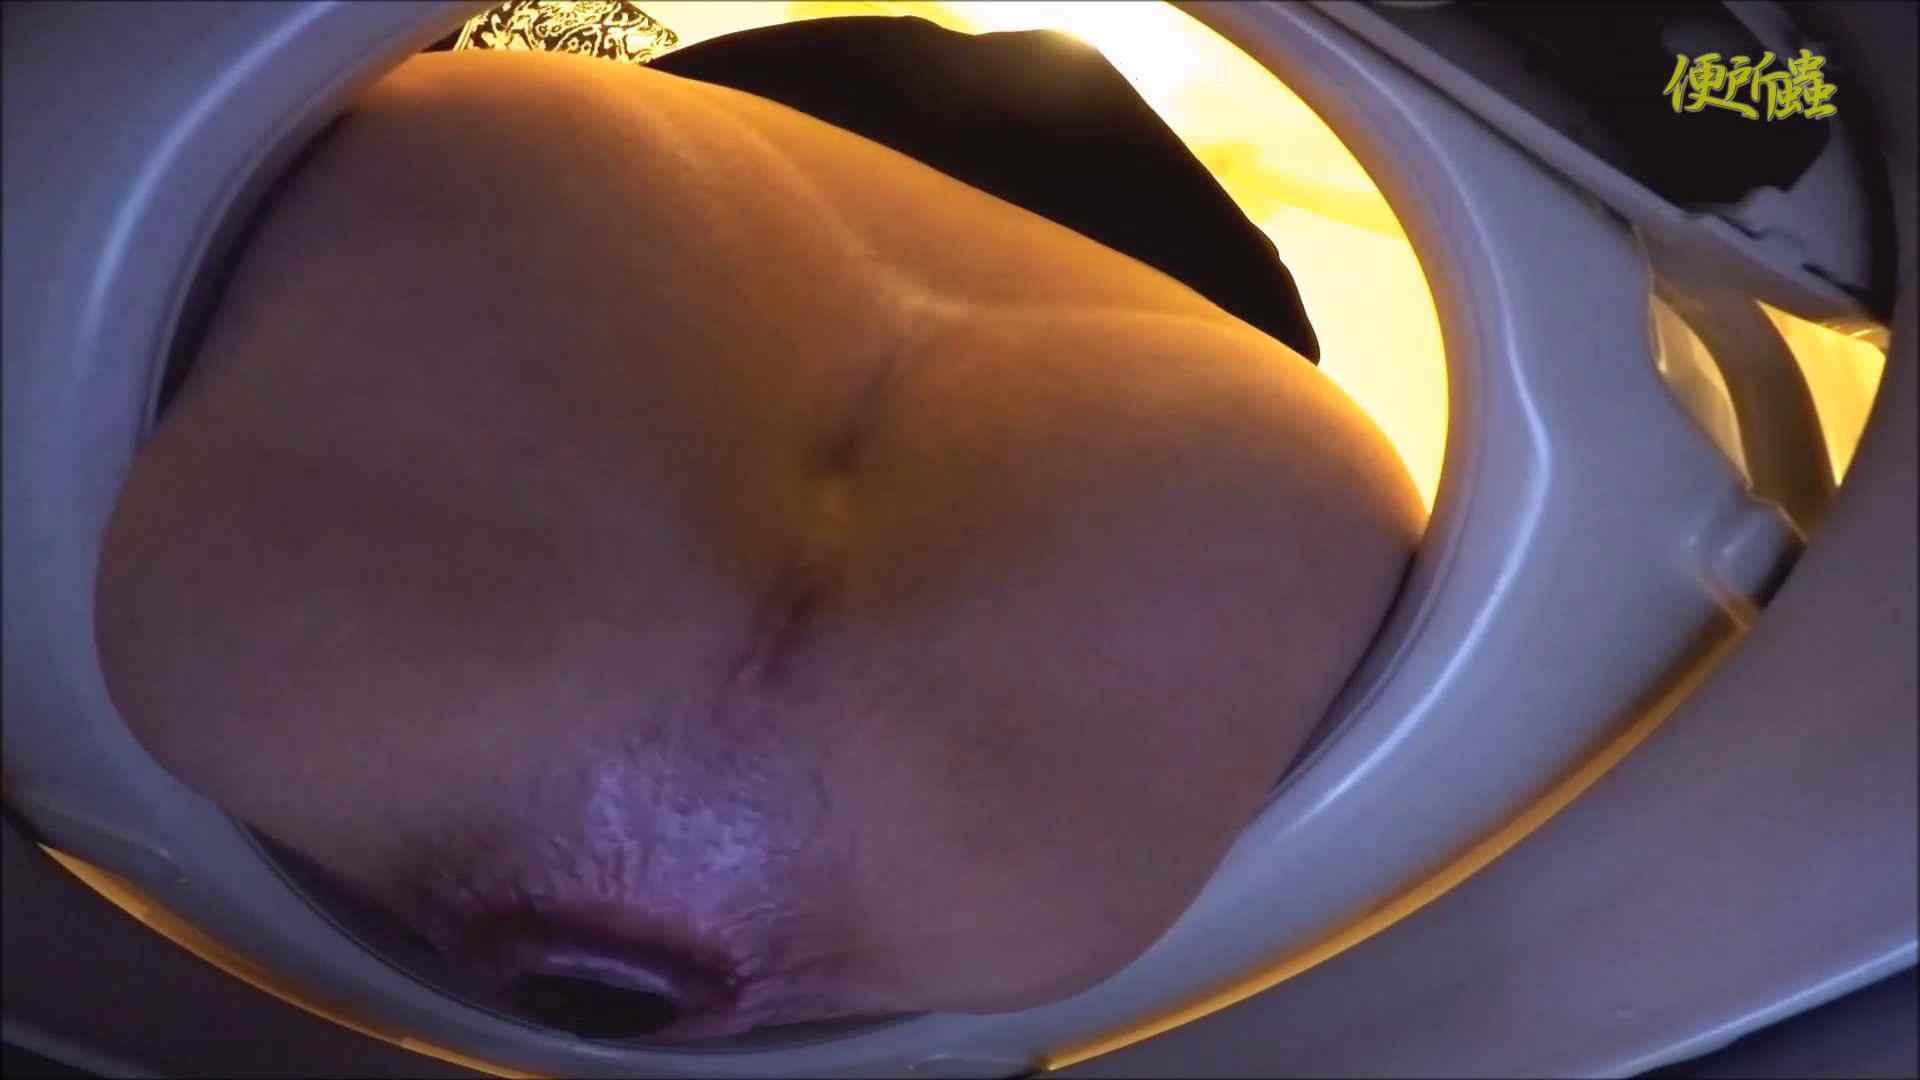 vol.04 便所蟲さんのリターン~寺子屋洗面所盗撮~ 洗面所 セックス無修正動画無料 83連発 78